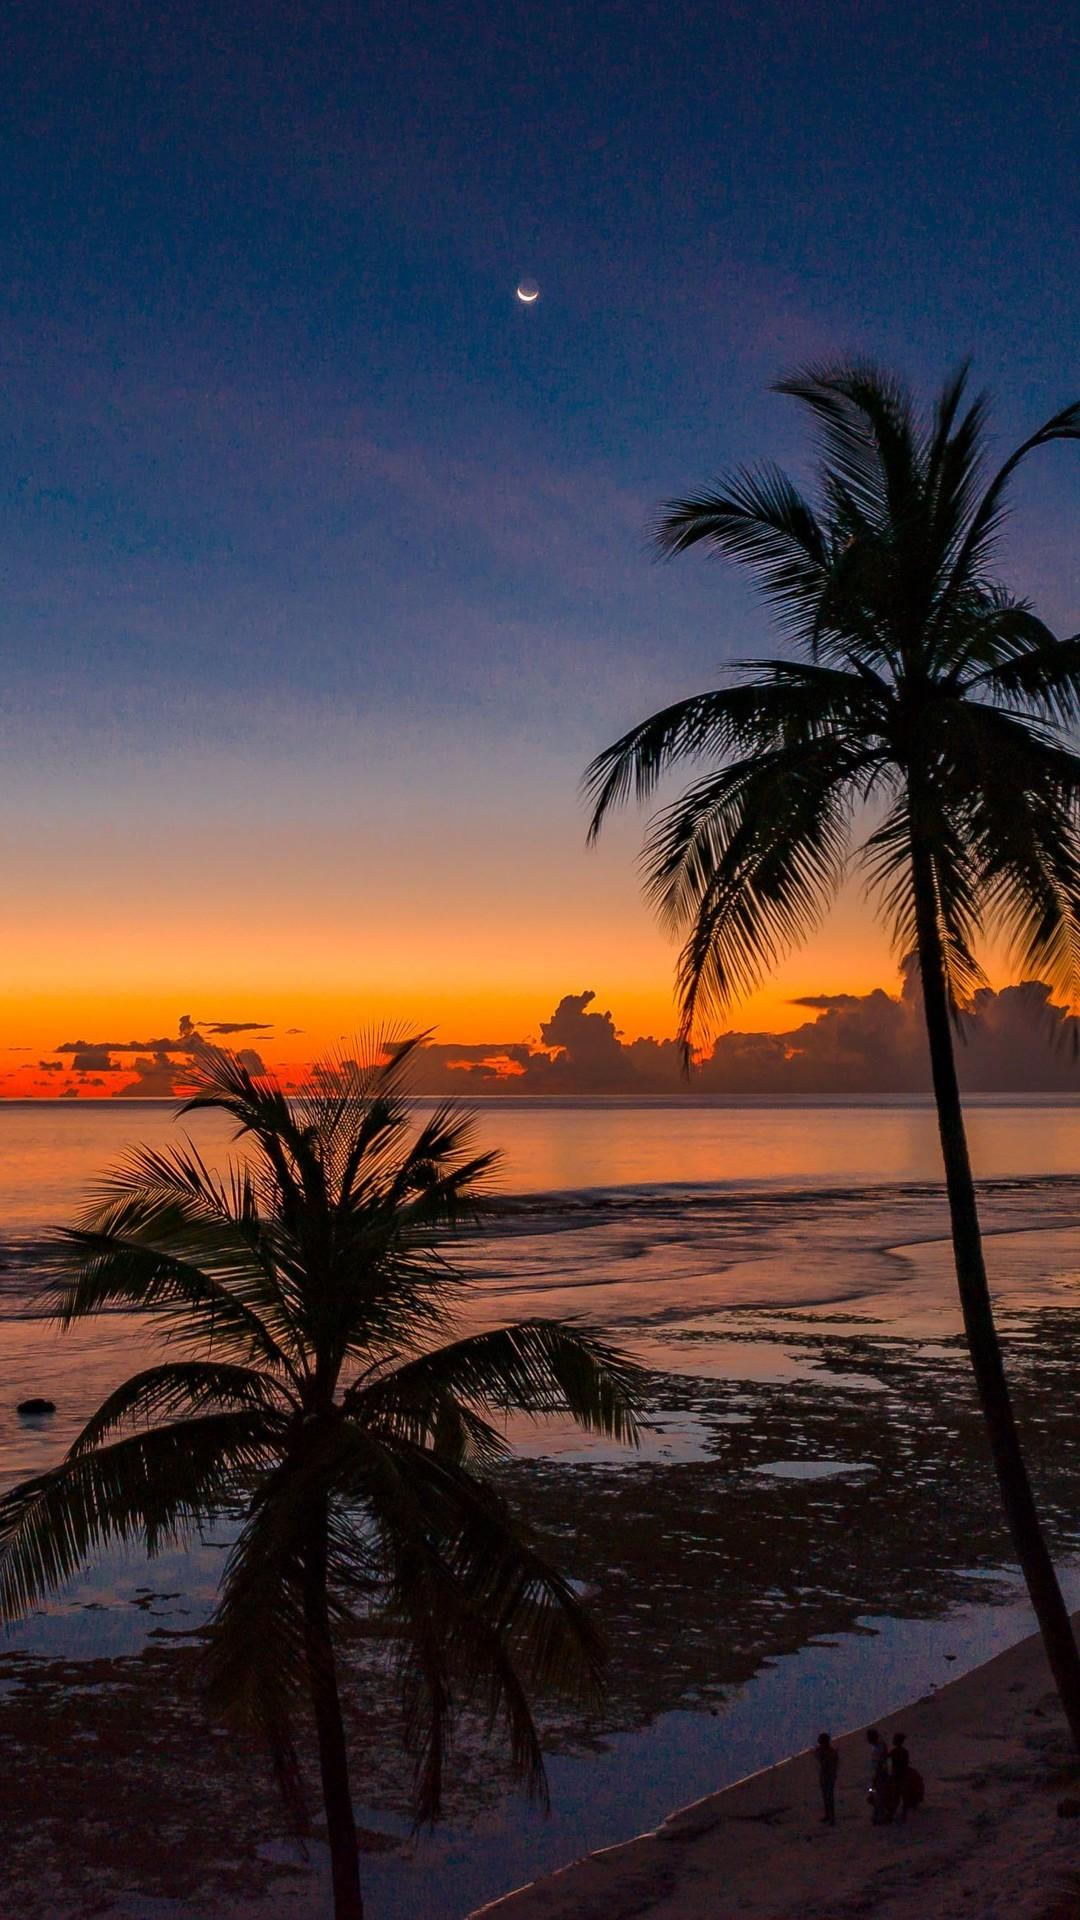 Beach Coconut Trees Hd Wallpaper